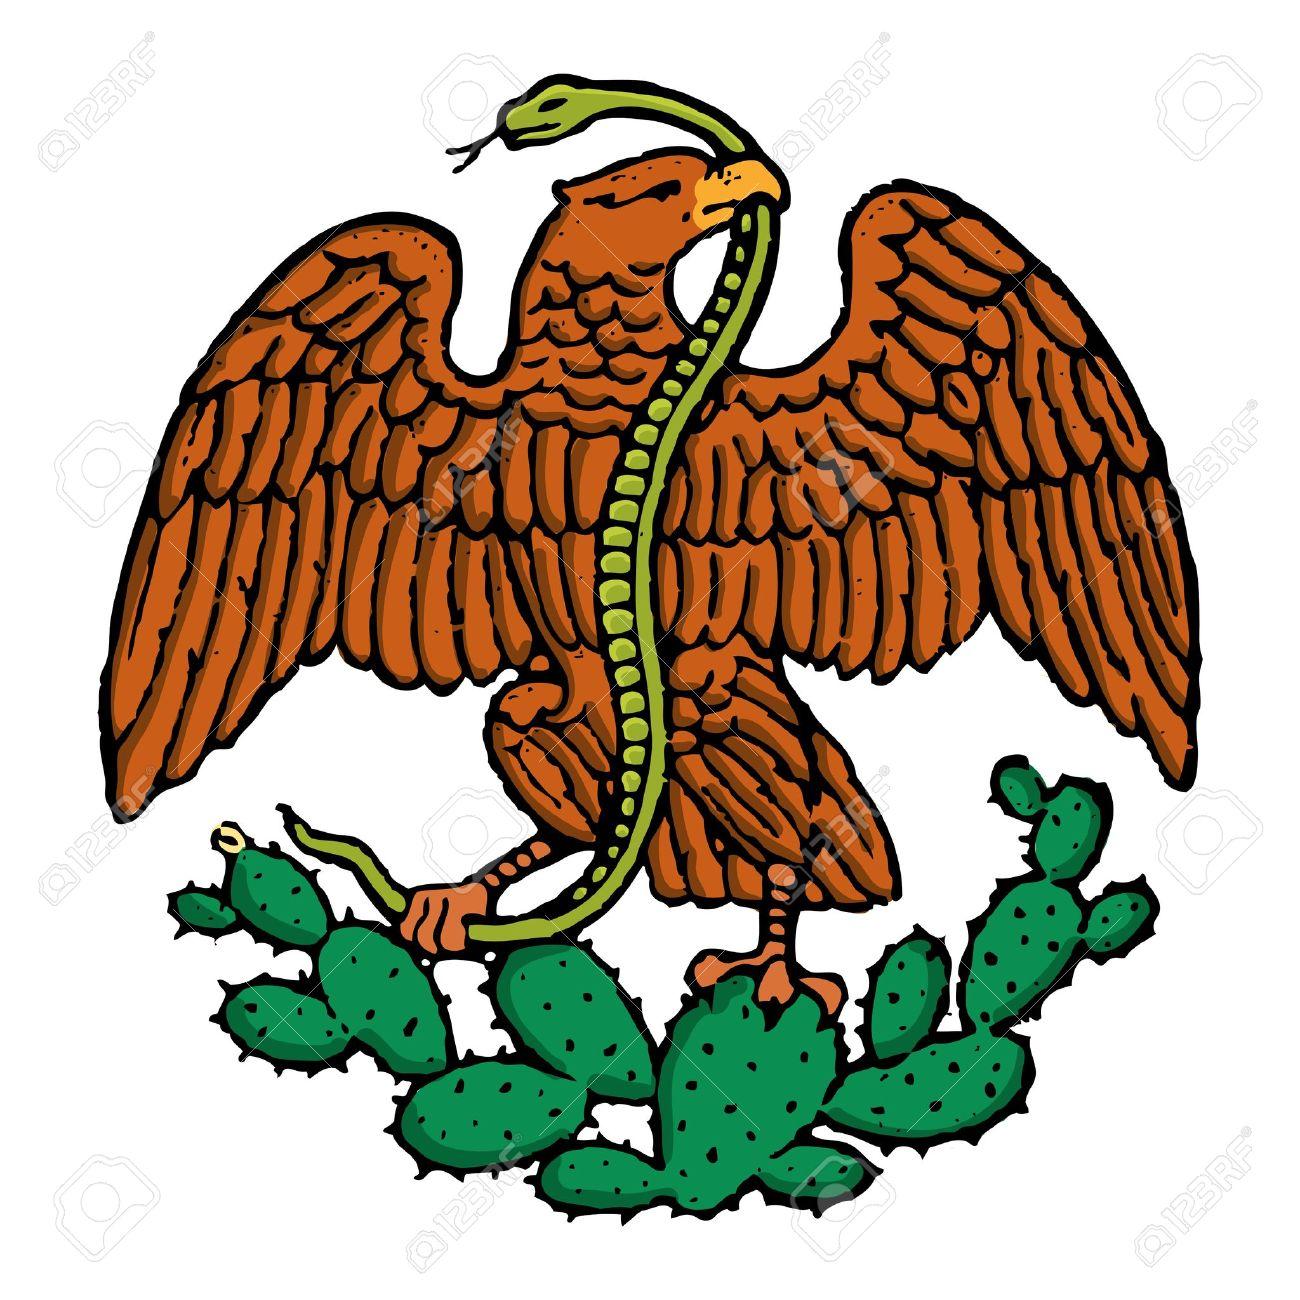 1300x1300 Eagle Clipart Mexican Eagle